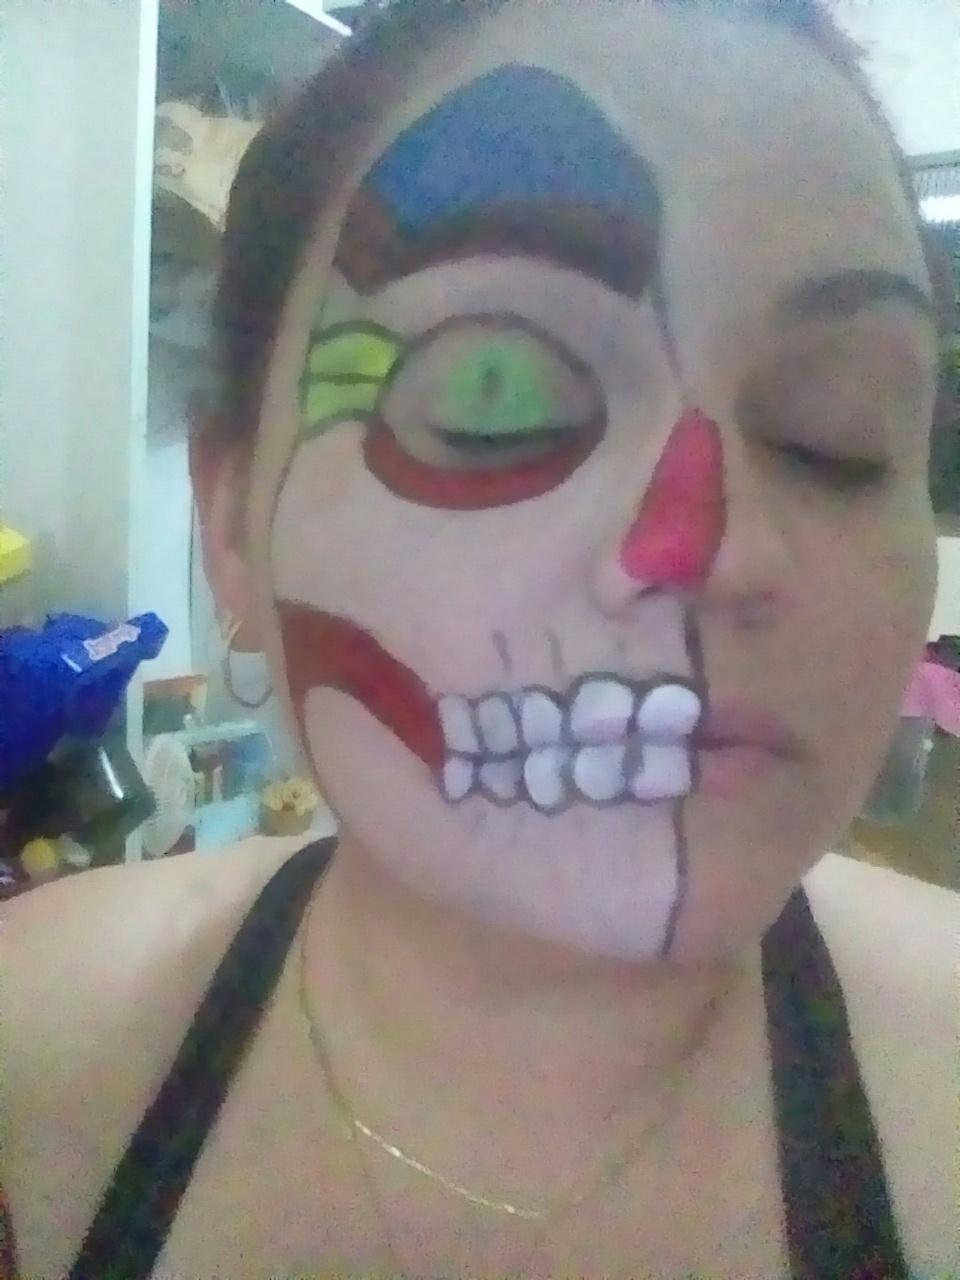 esteticista manicure e pedicure maquiador(a)